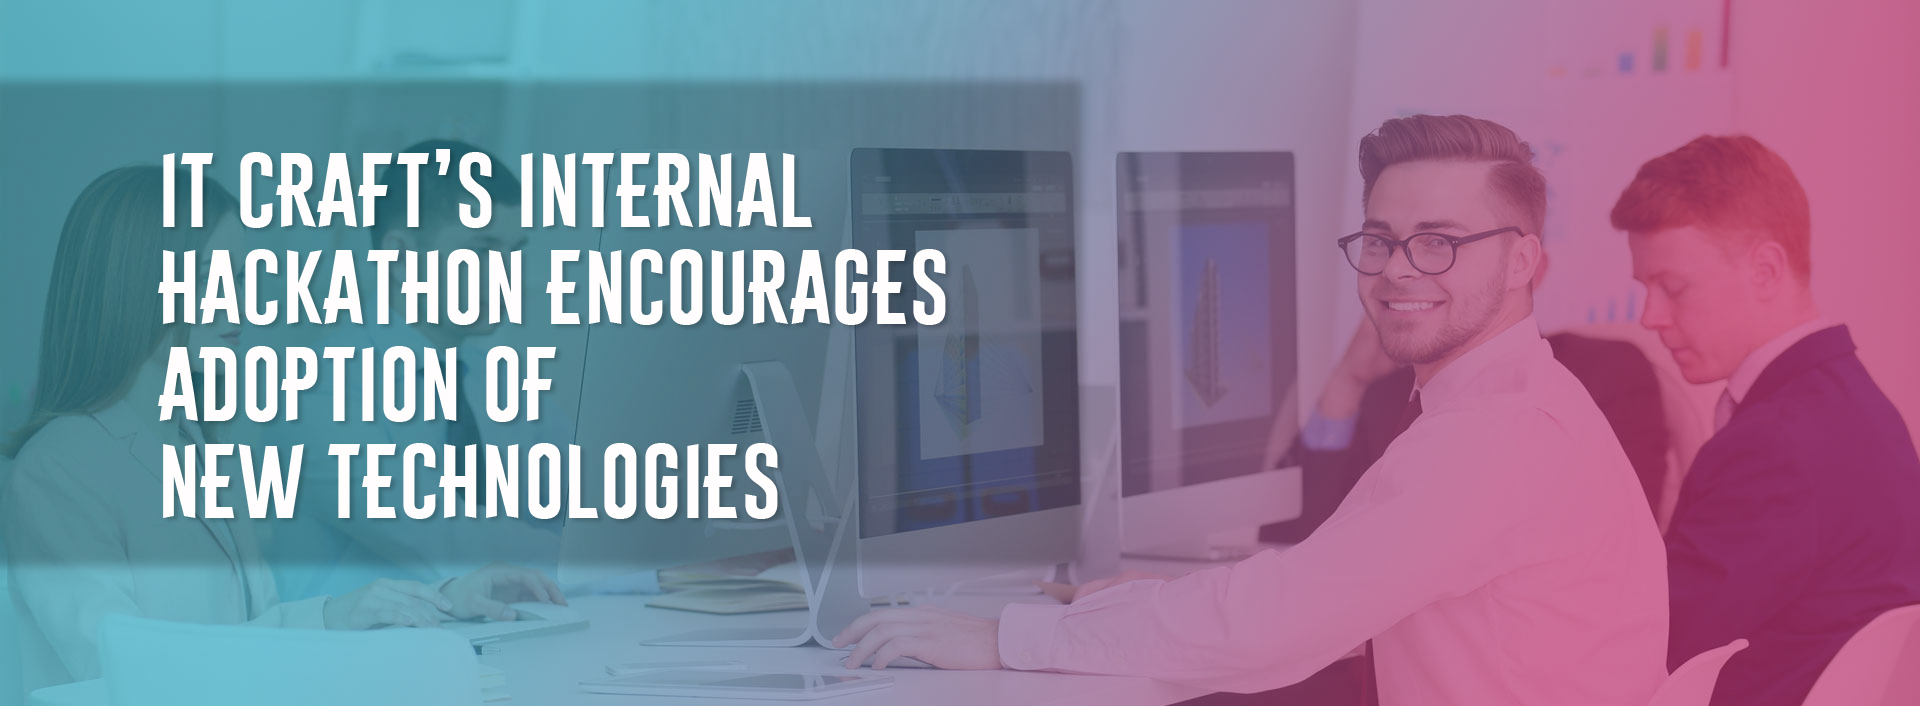 IT Craft's Internal Hackathon Encourages Adoption of New Technologies